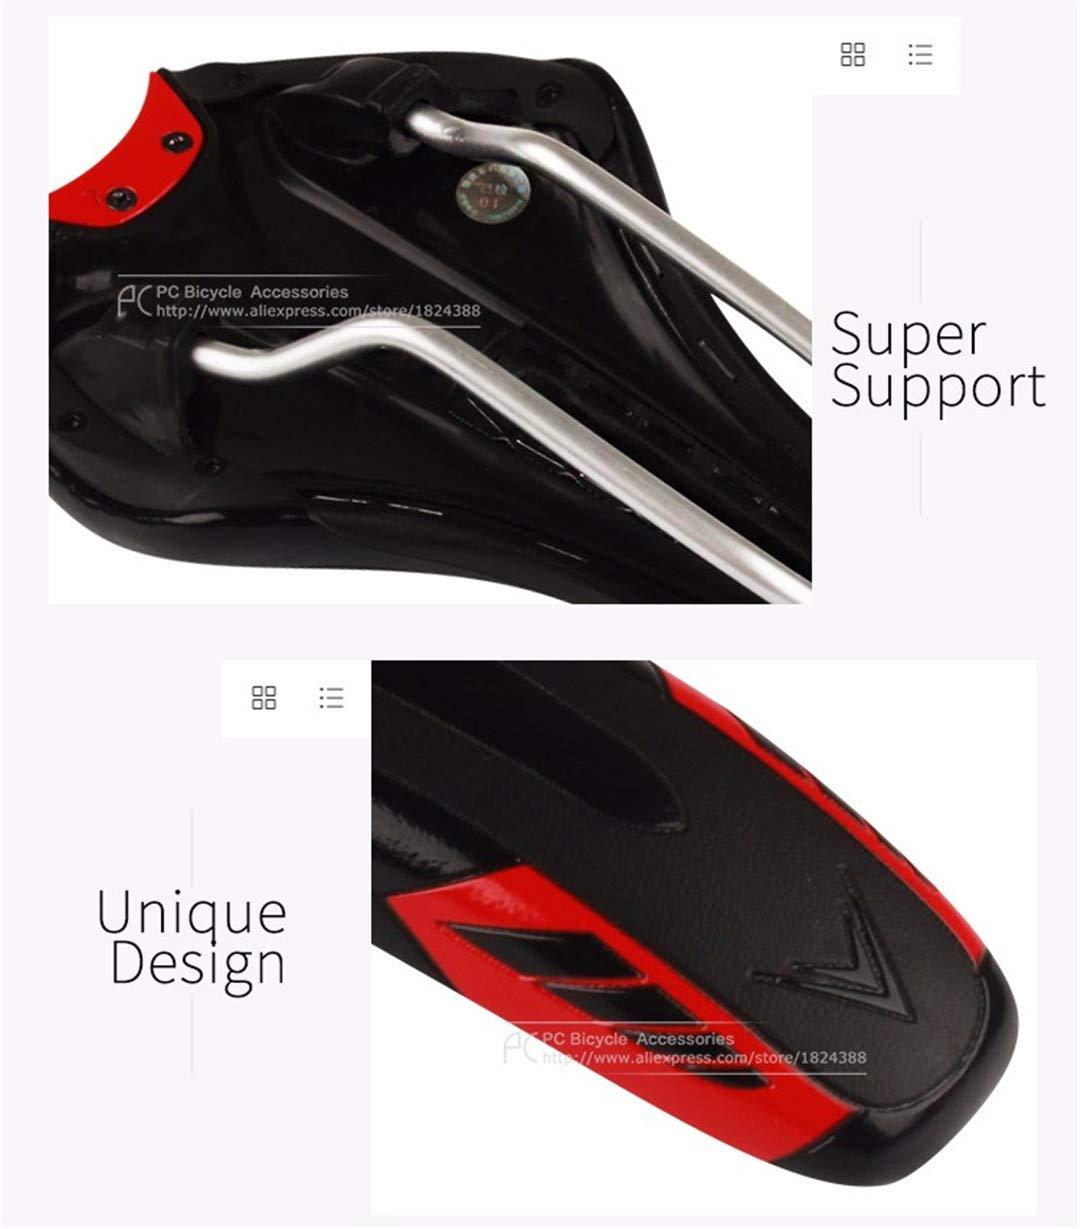 Tosnlve - Cojín de Piel Antideslizante para sillín de Bicicleta, Impermeable, para Bicicleta de montaña, Bicicleta de Carretera, Hombre Mujer Infantil, ...